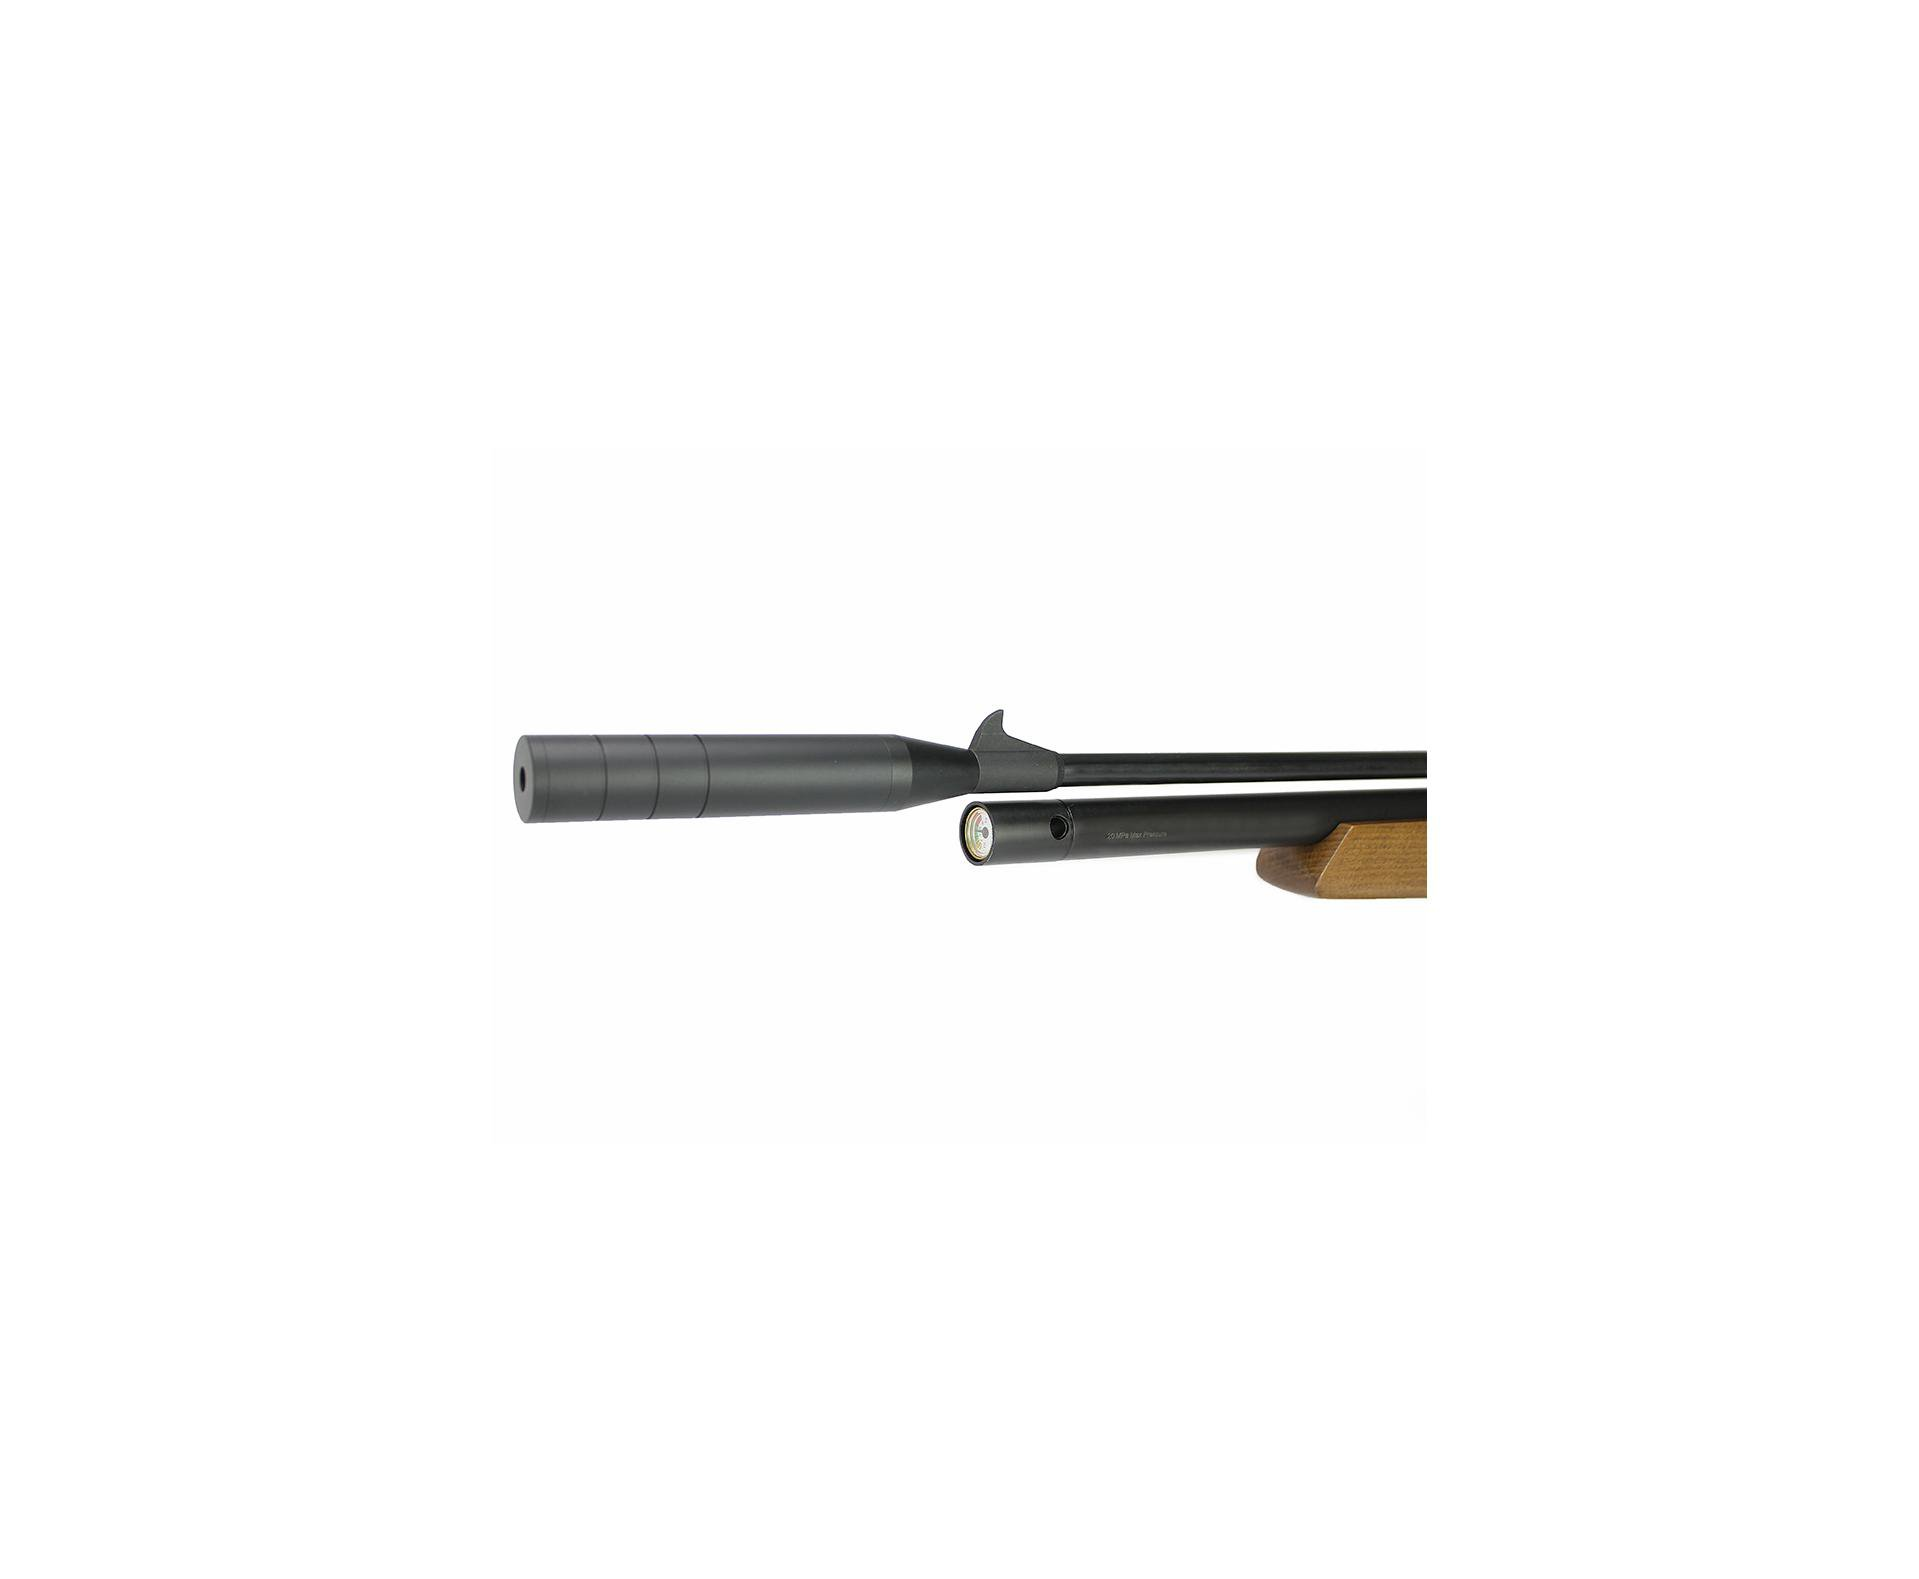 Carabina De Pressão Pcp Pr900w G2 5,5mm New Generation Artemis + Luneta 4x32 + Bomba Manual + Capa + Chumbinho